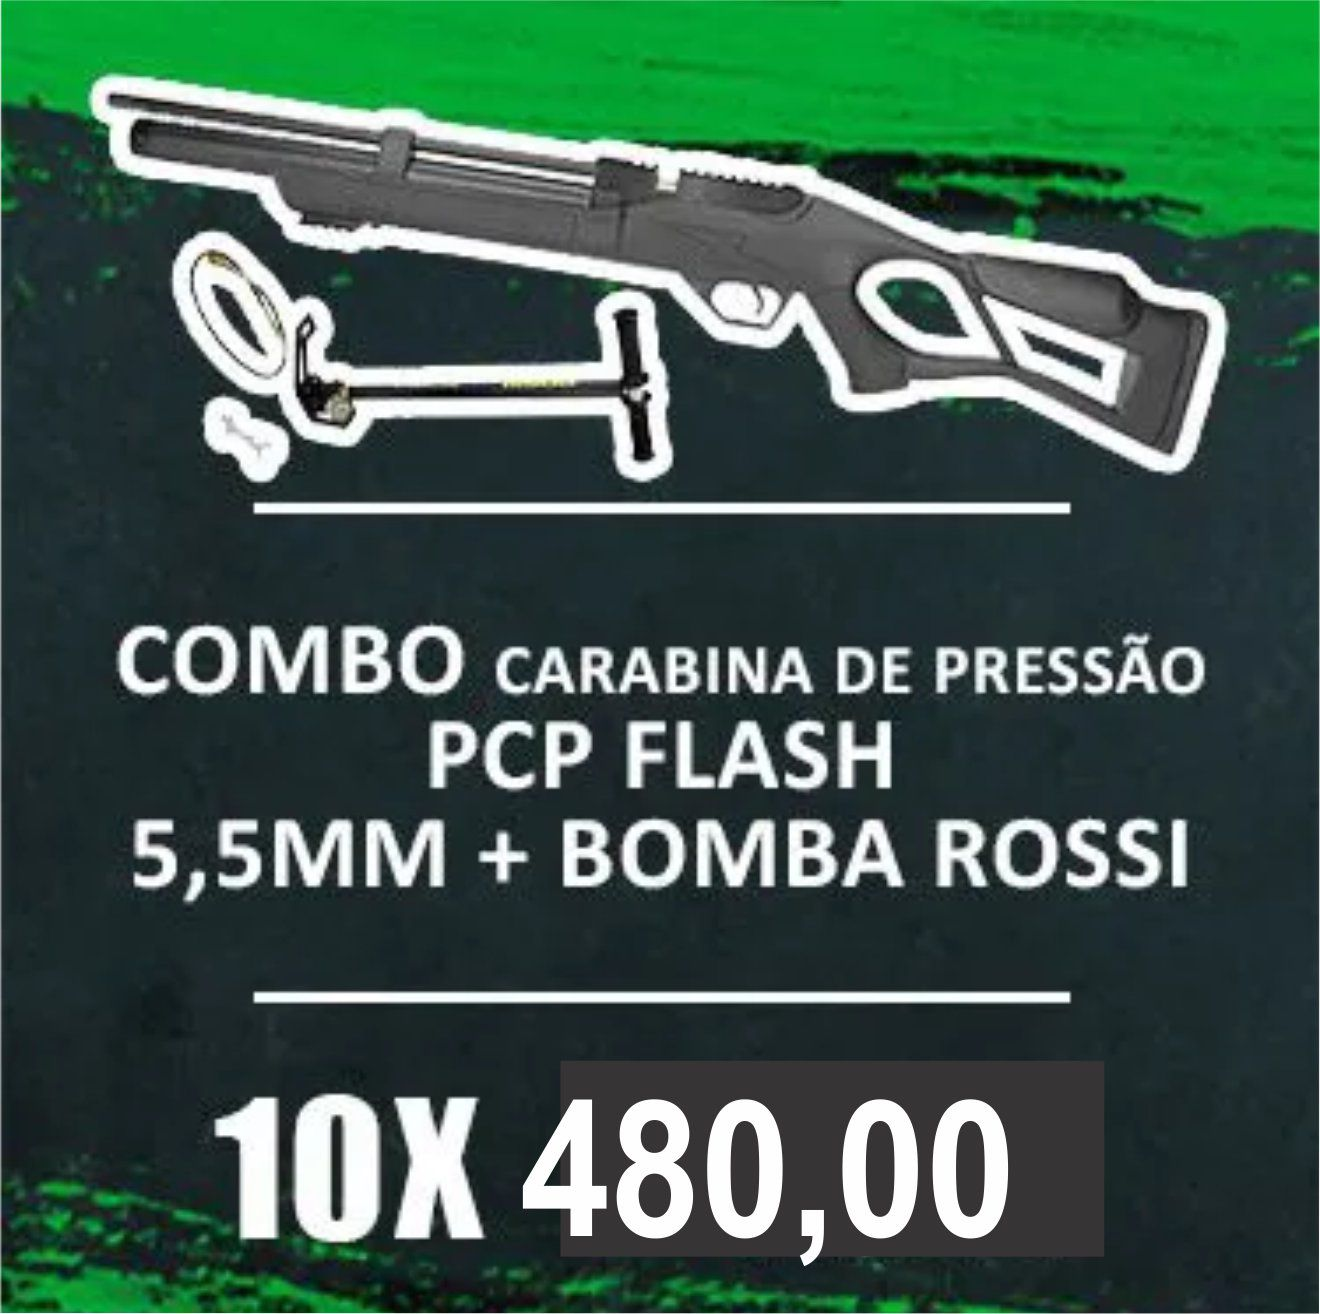 Consórcio - CARABINA PCP FLASH 5,5mm + Bomba Rossi